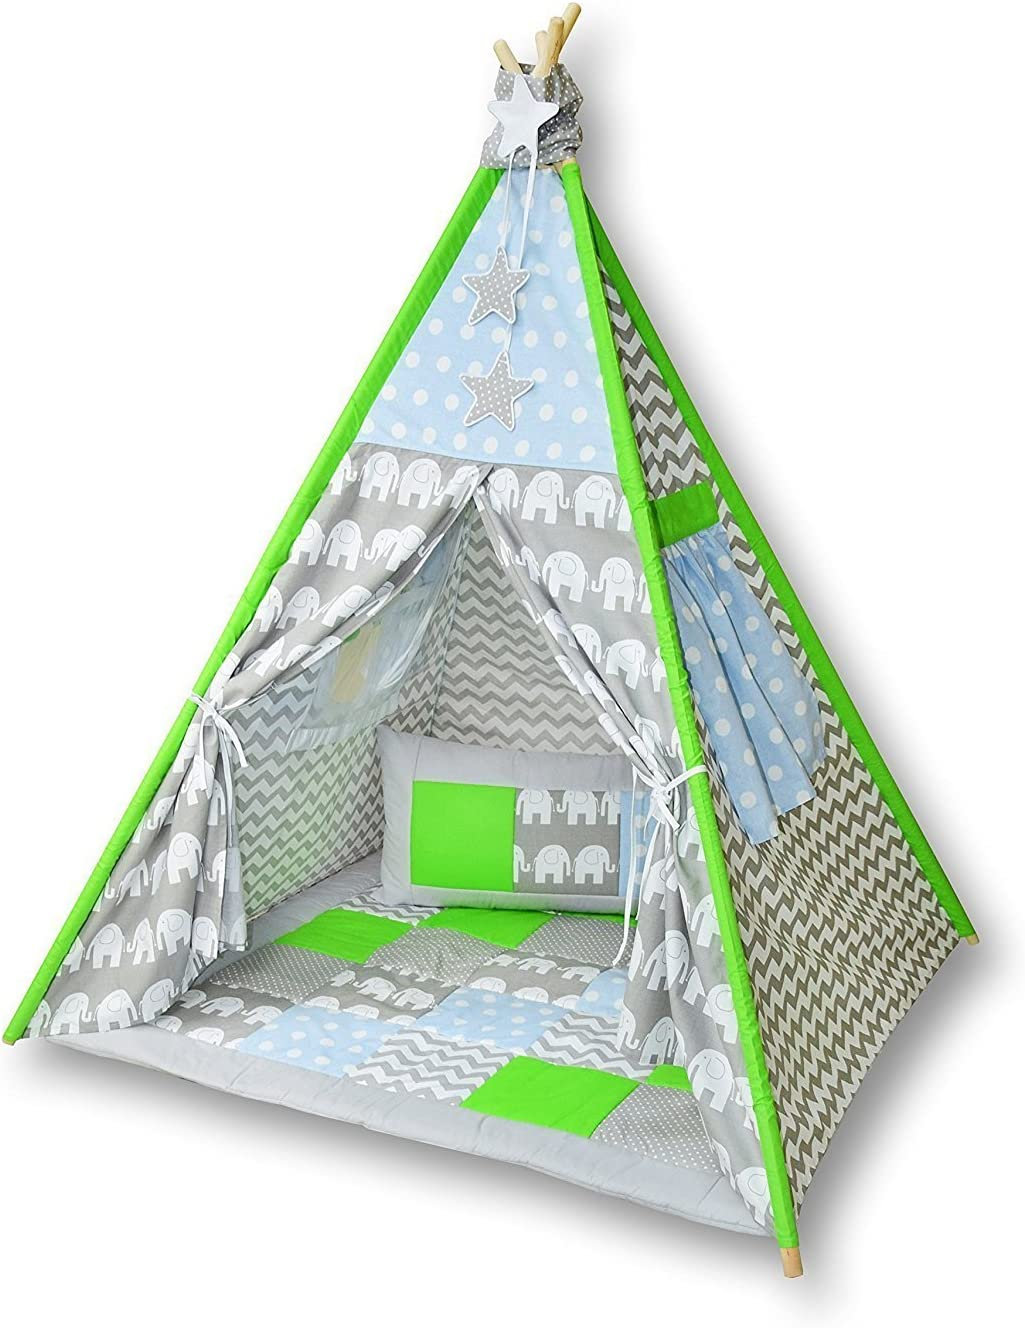 Amilian® Tipi Spielzelt Zelt für Kinder T03 Spielzelt